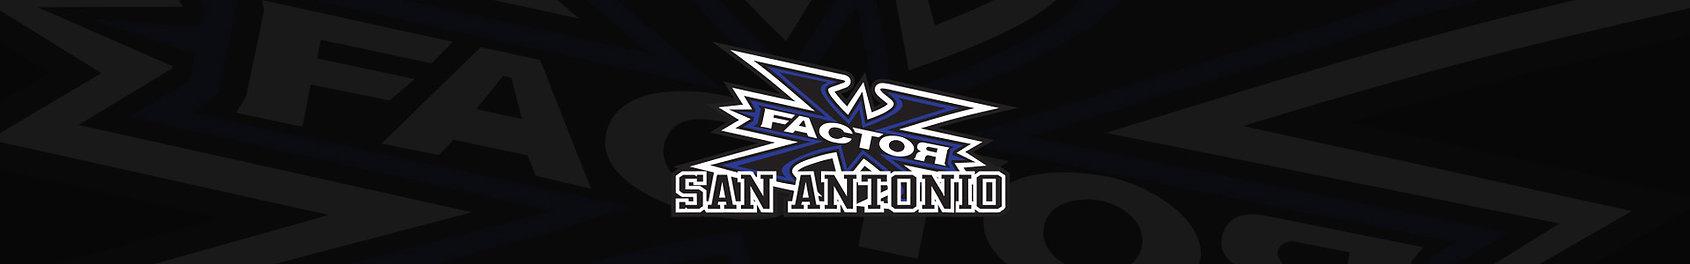 LogoBar_SanAntonioXFactor.jpg